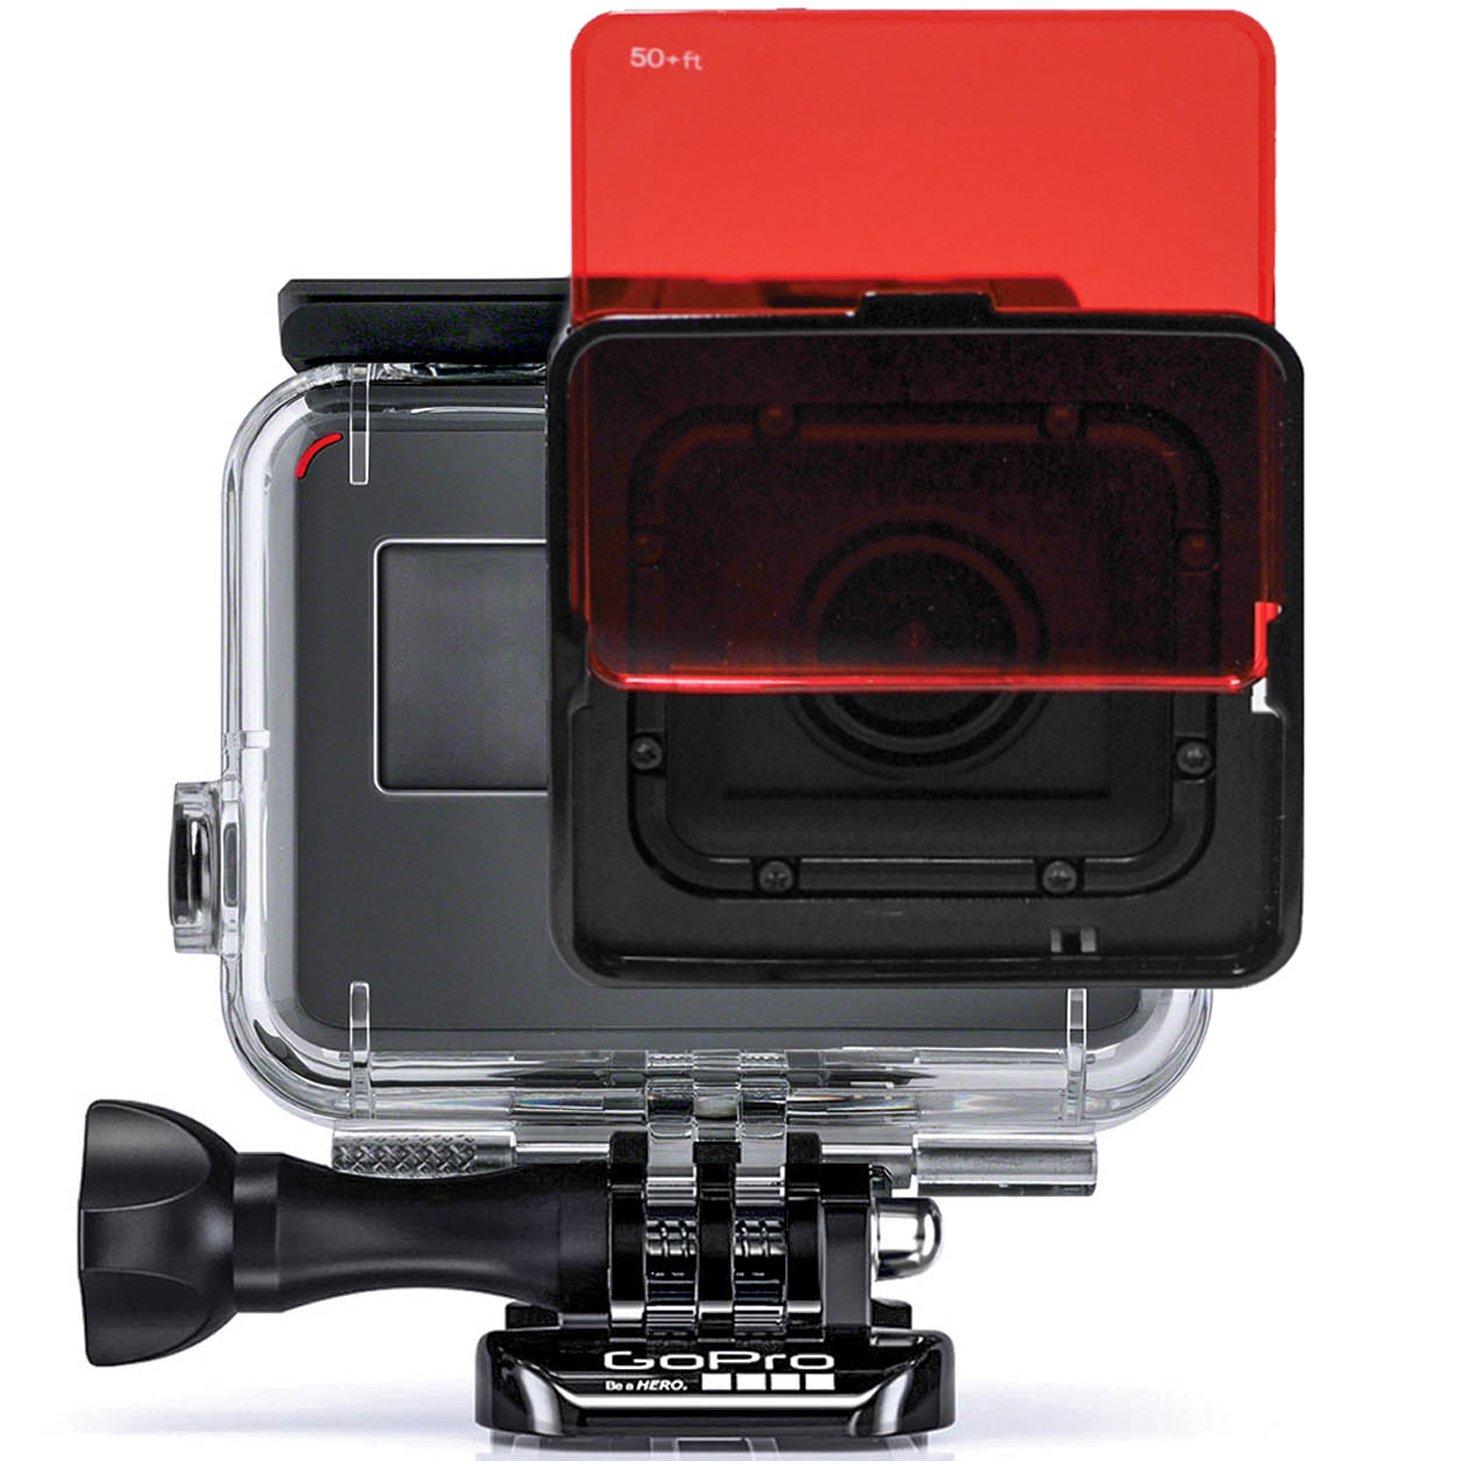 SANDMARC Aqua Dive Filter for GoPro Hero 7, Hero 6 & Hero 5 Super Suit (Dive Housing) - Red, Magenta and Yellow Filter Pack - Diving, Scuba and Snorkeling Accessories